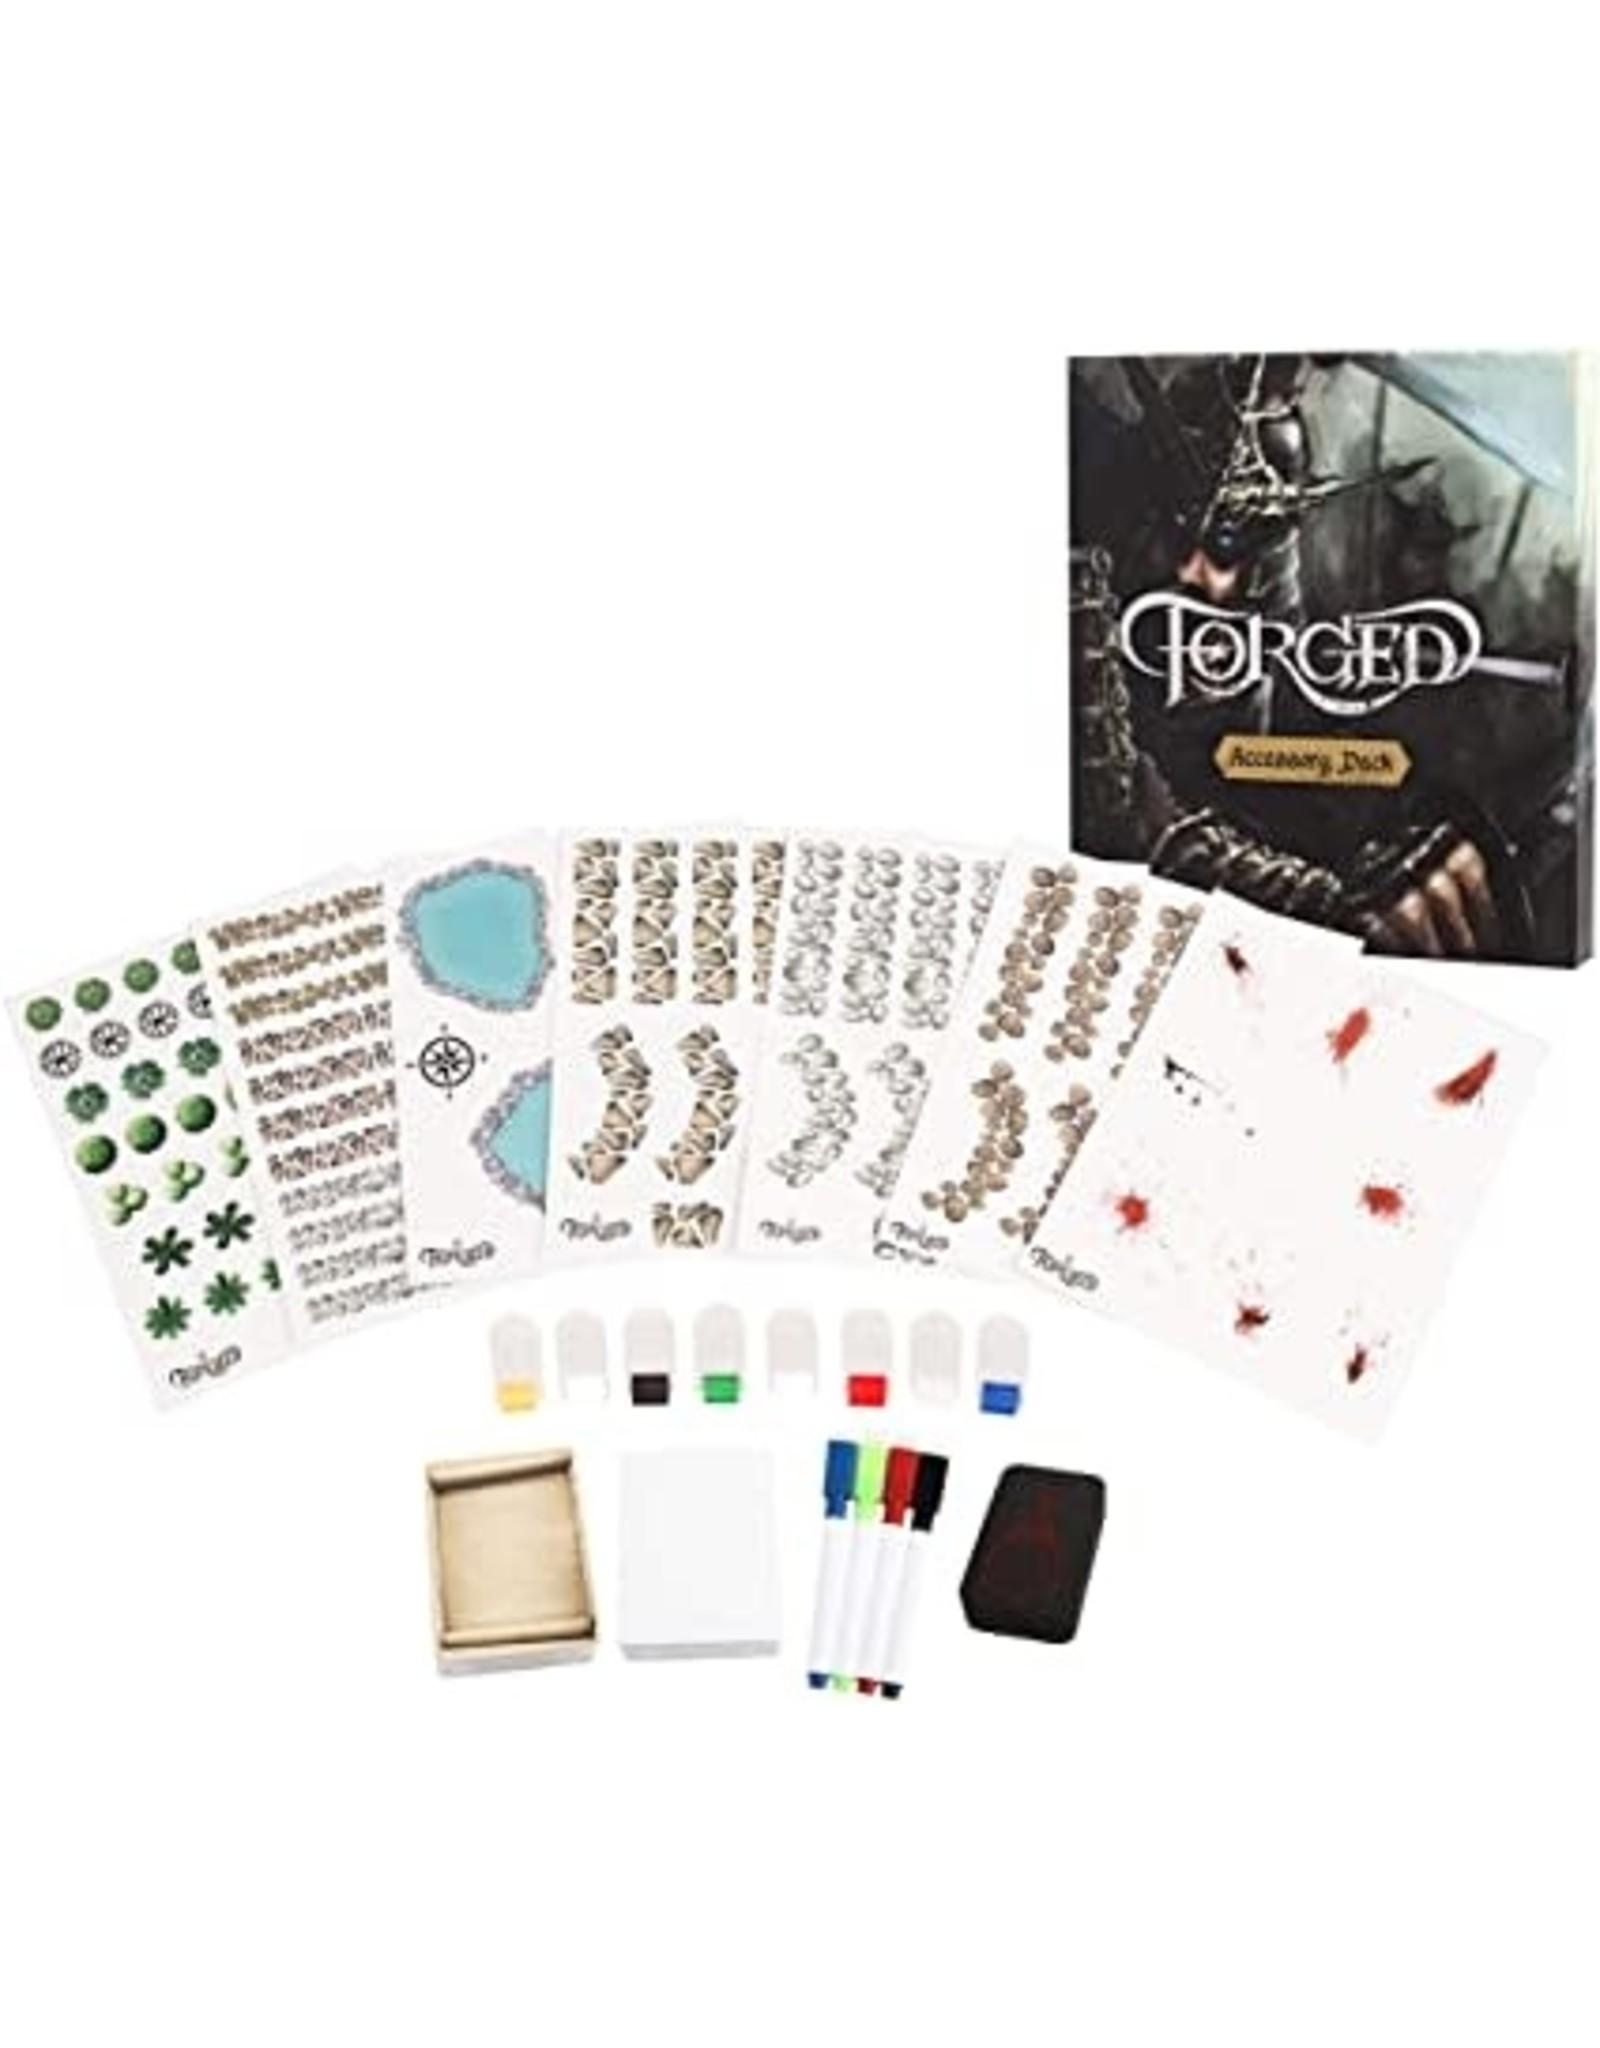 ForgedDice: Accessory Pack